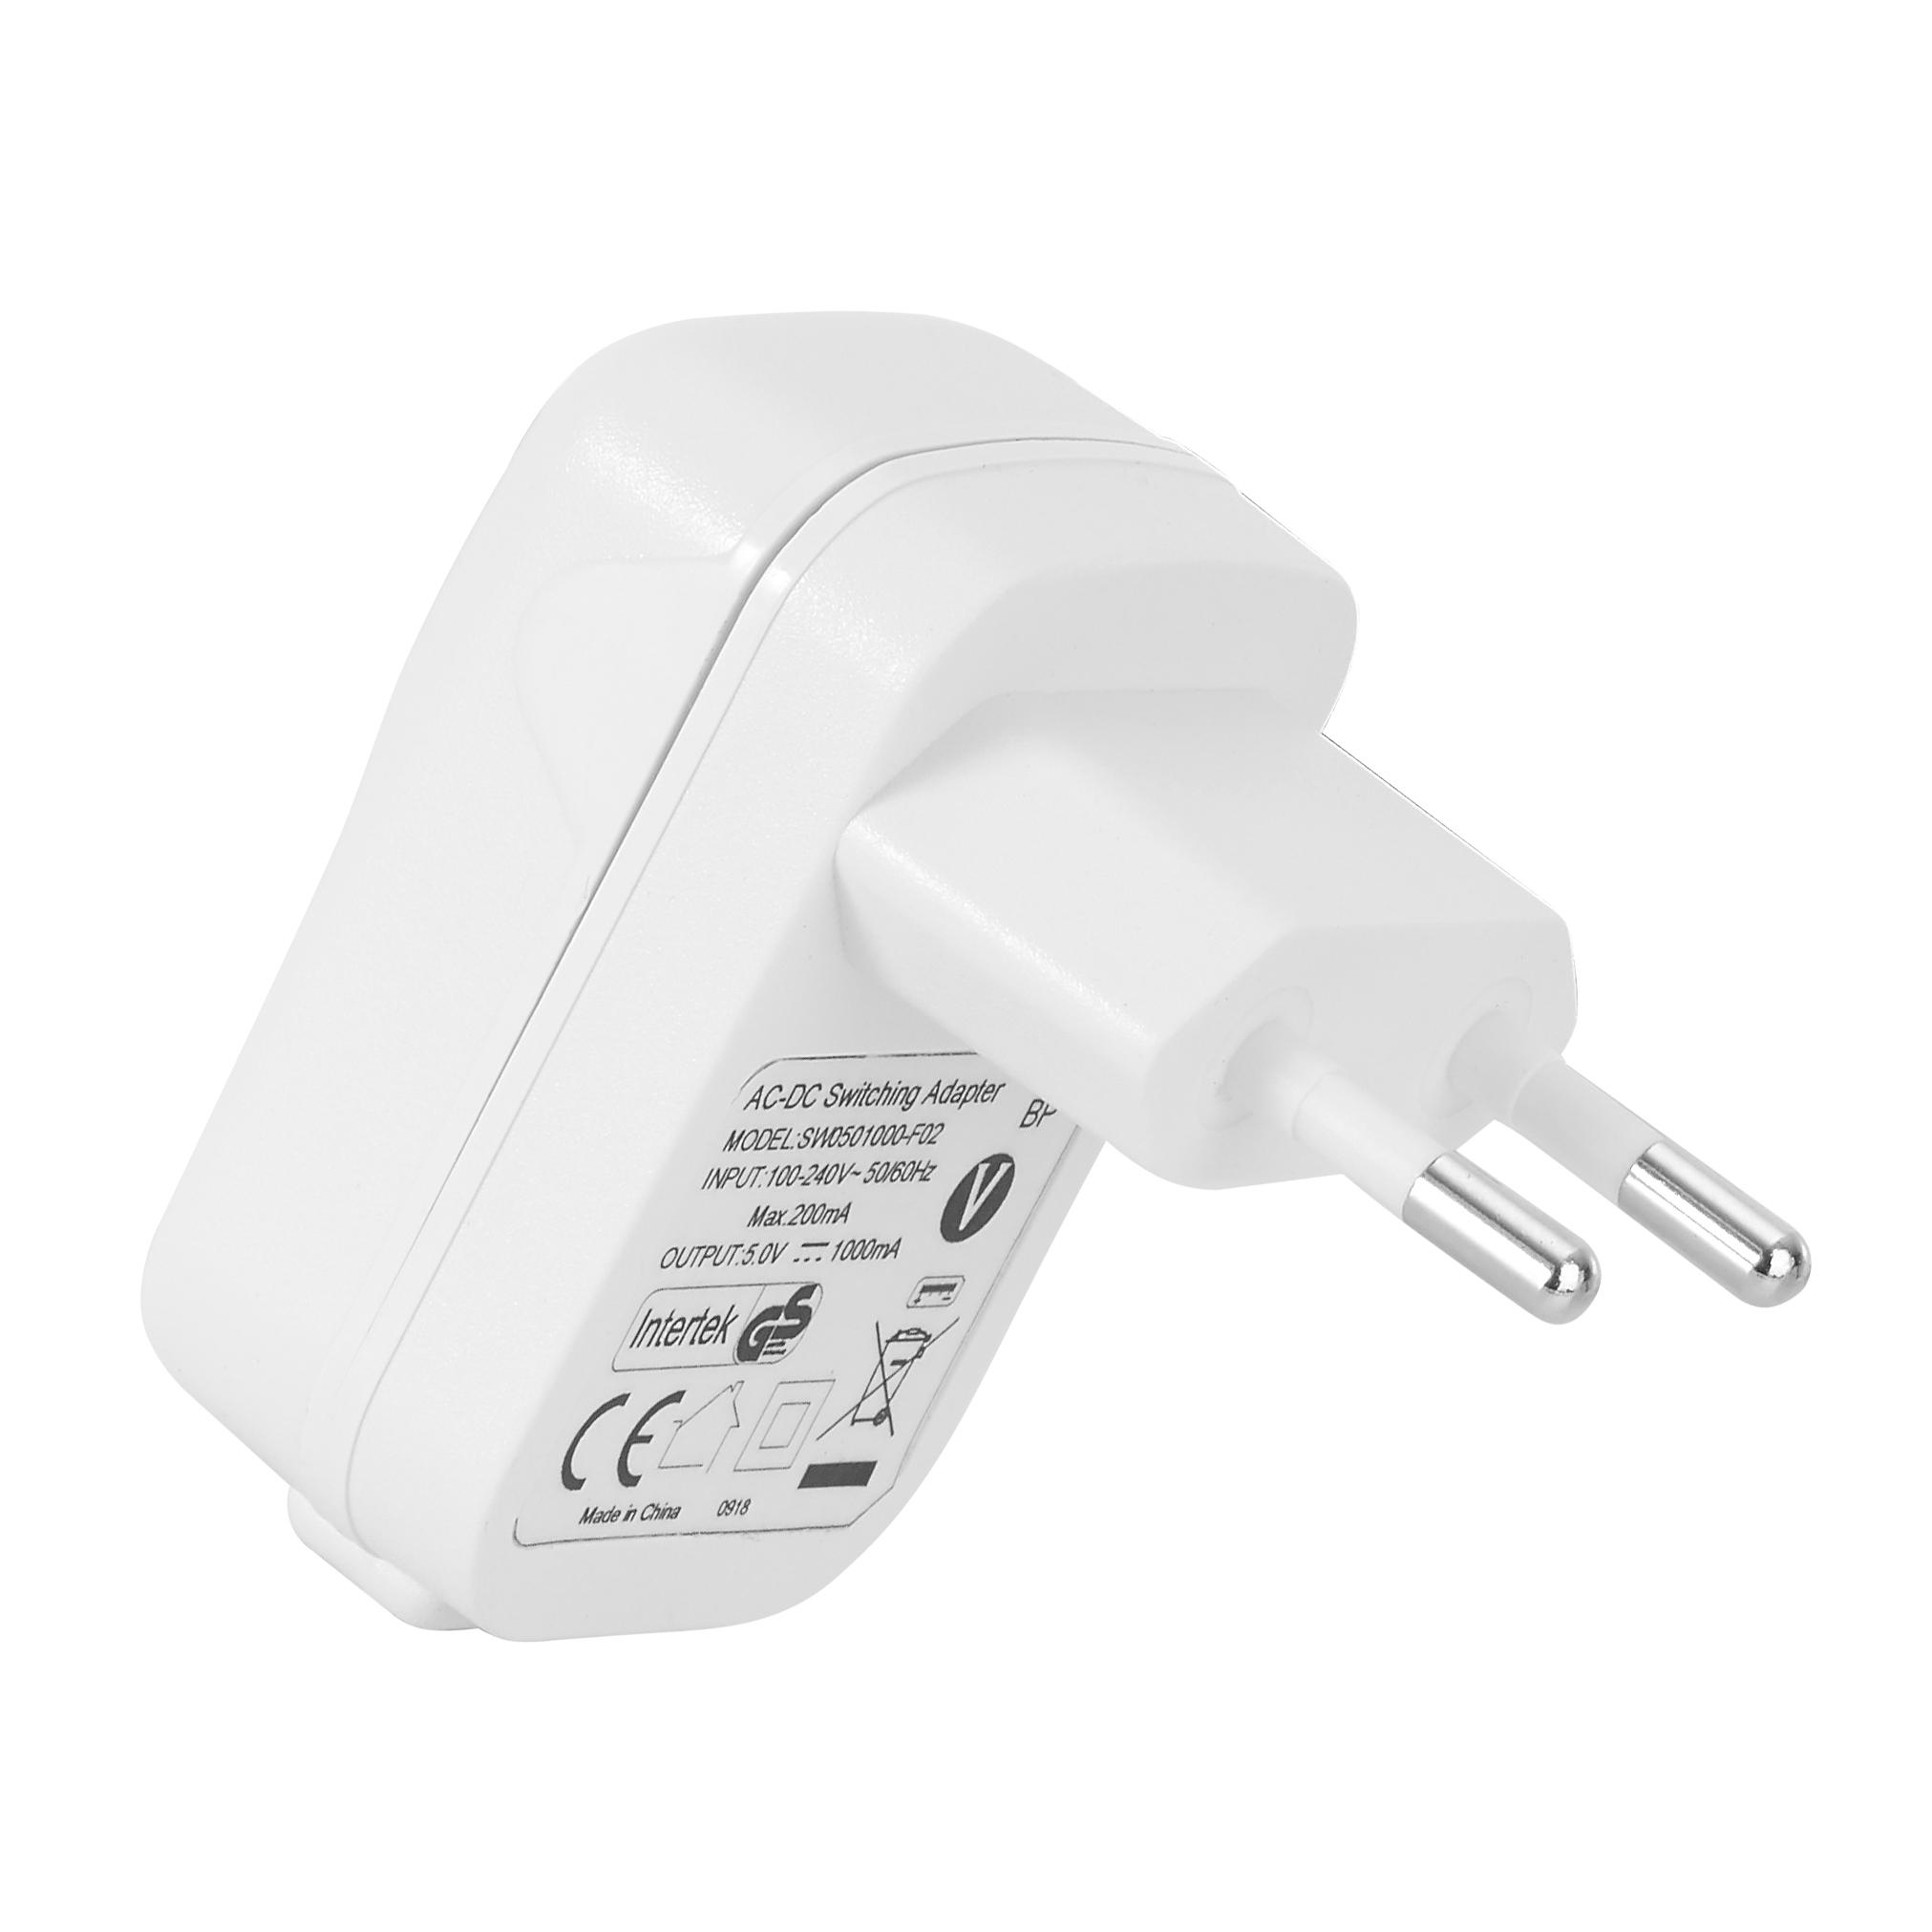 A014626-PHOTO-02-Babymonitor-EU-Plug-36612761643525e1c982a4d312